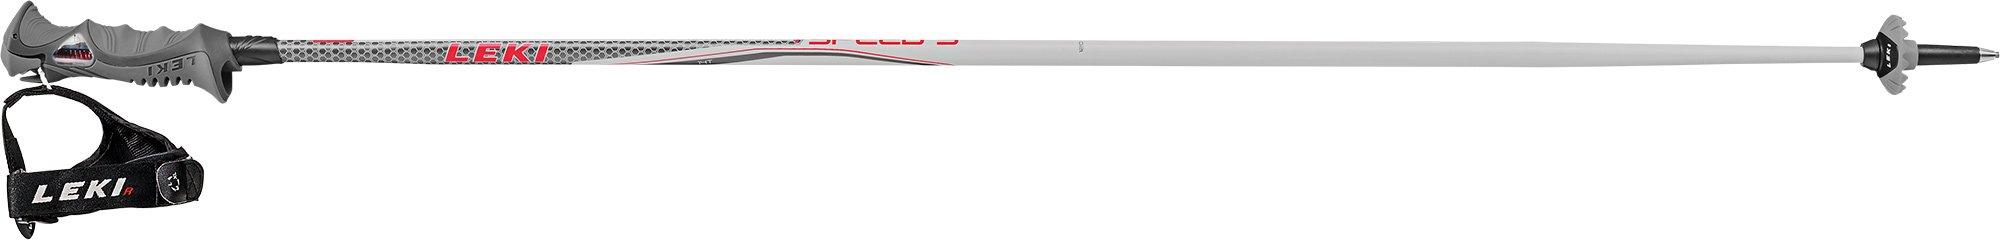 Leki Speed S 135